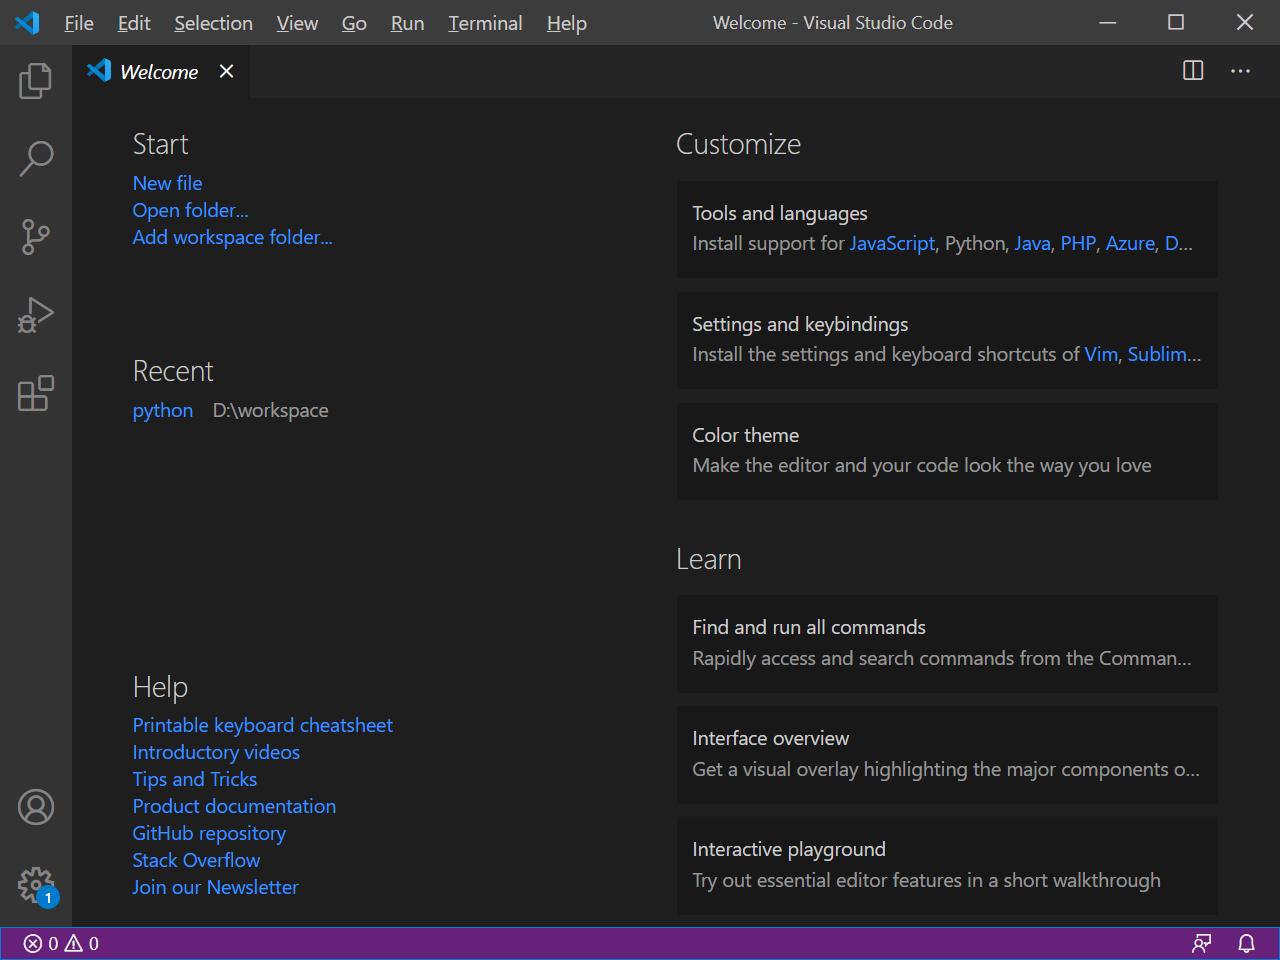 Cypress Tutorial Step 1 - Open Visual Studio Code